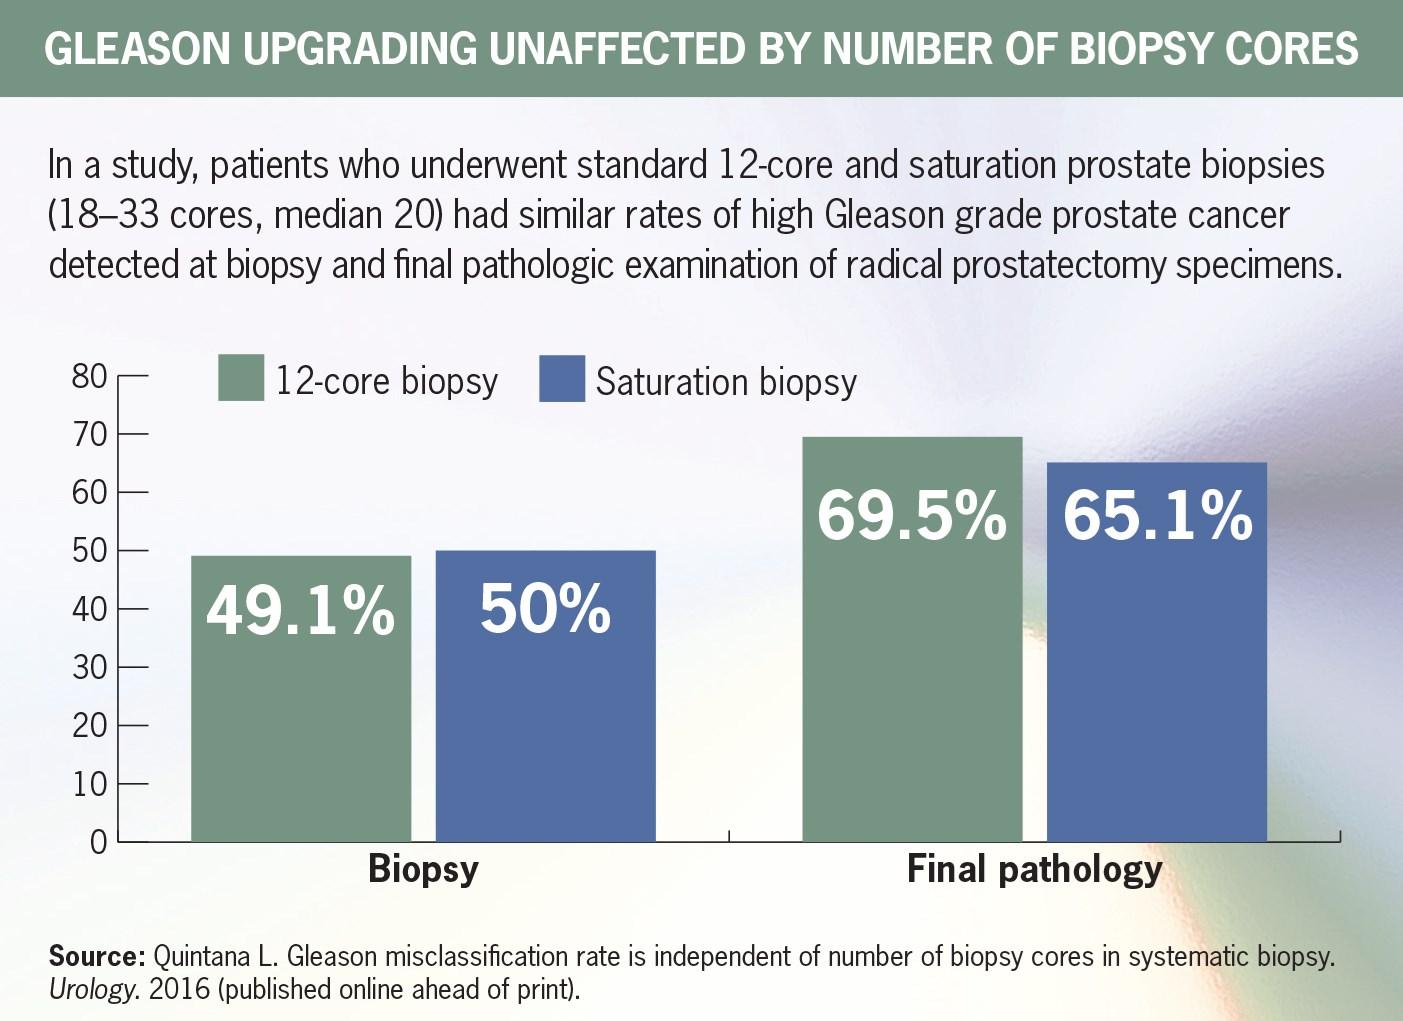 Saturation Prostate Biopsy Not Better